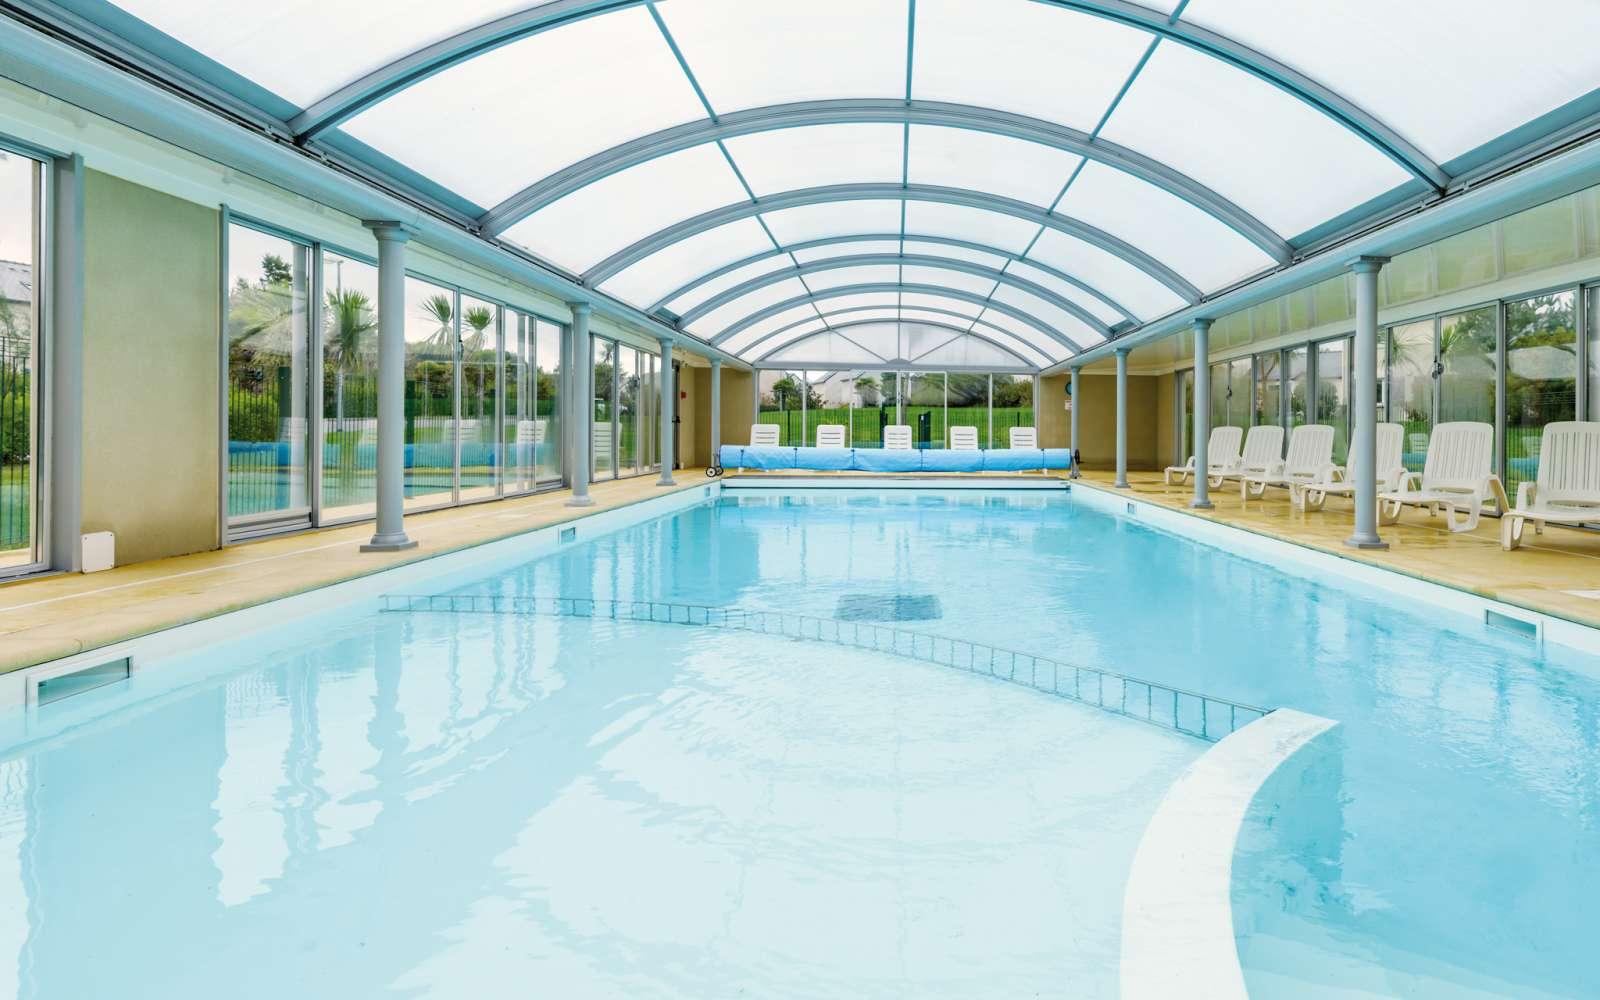 Location vacances avec piscine for Residence vacances ardeche avec piscine